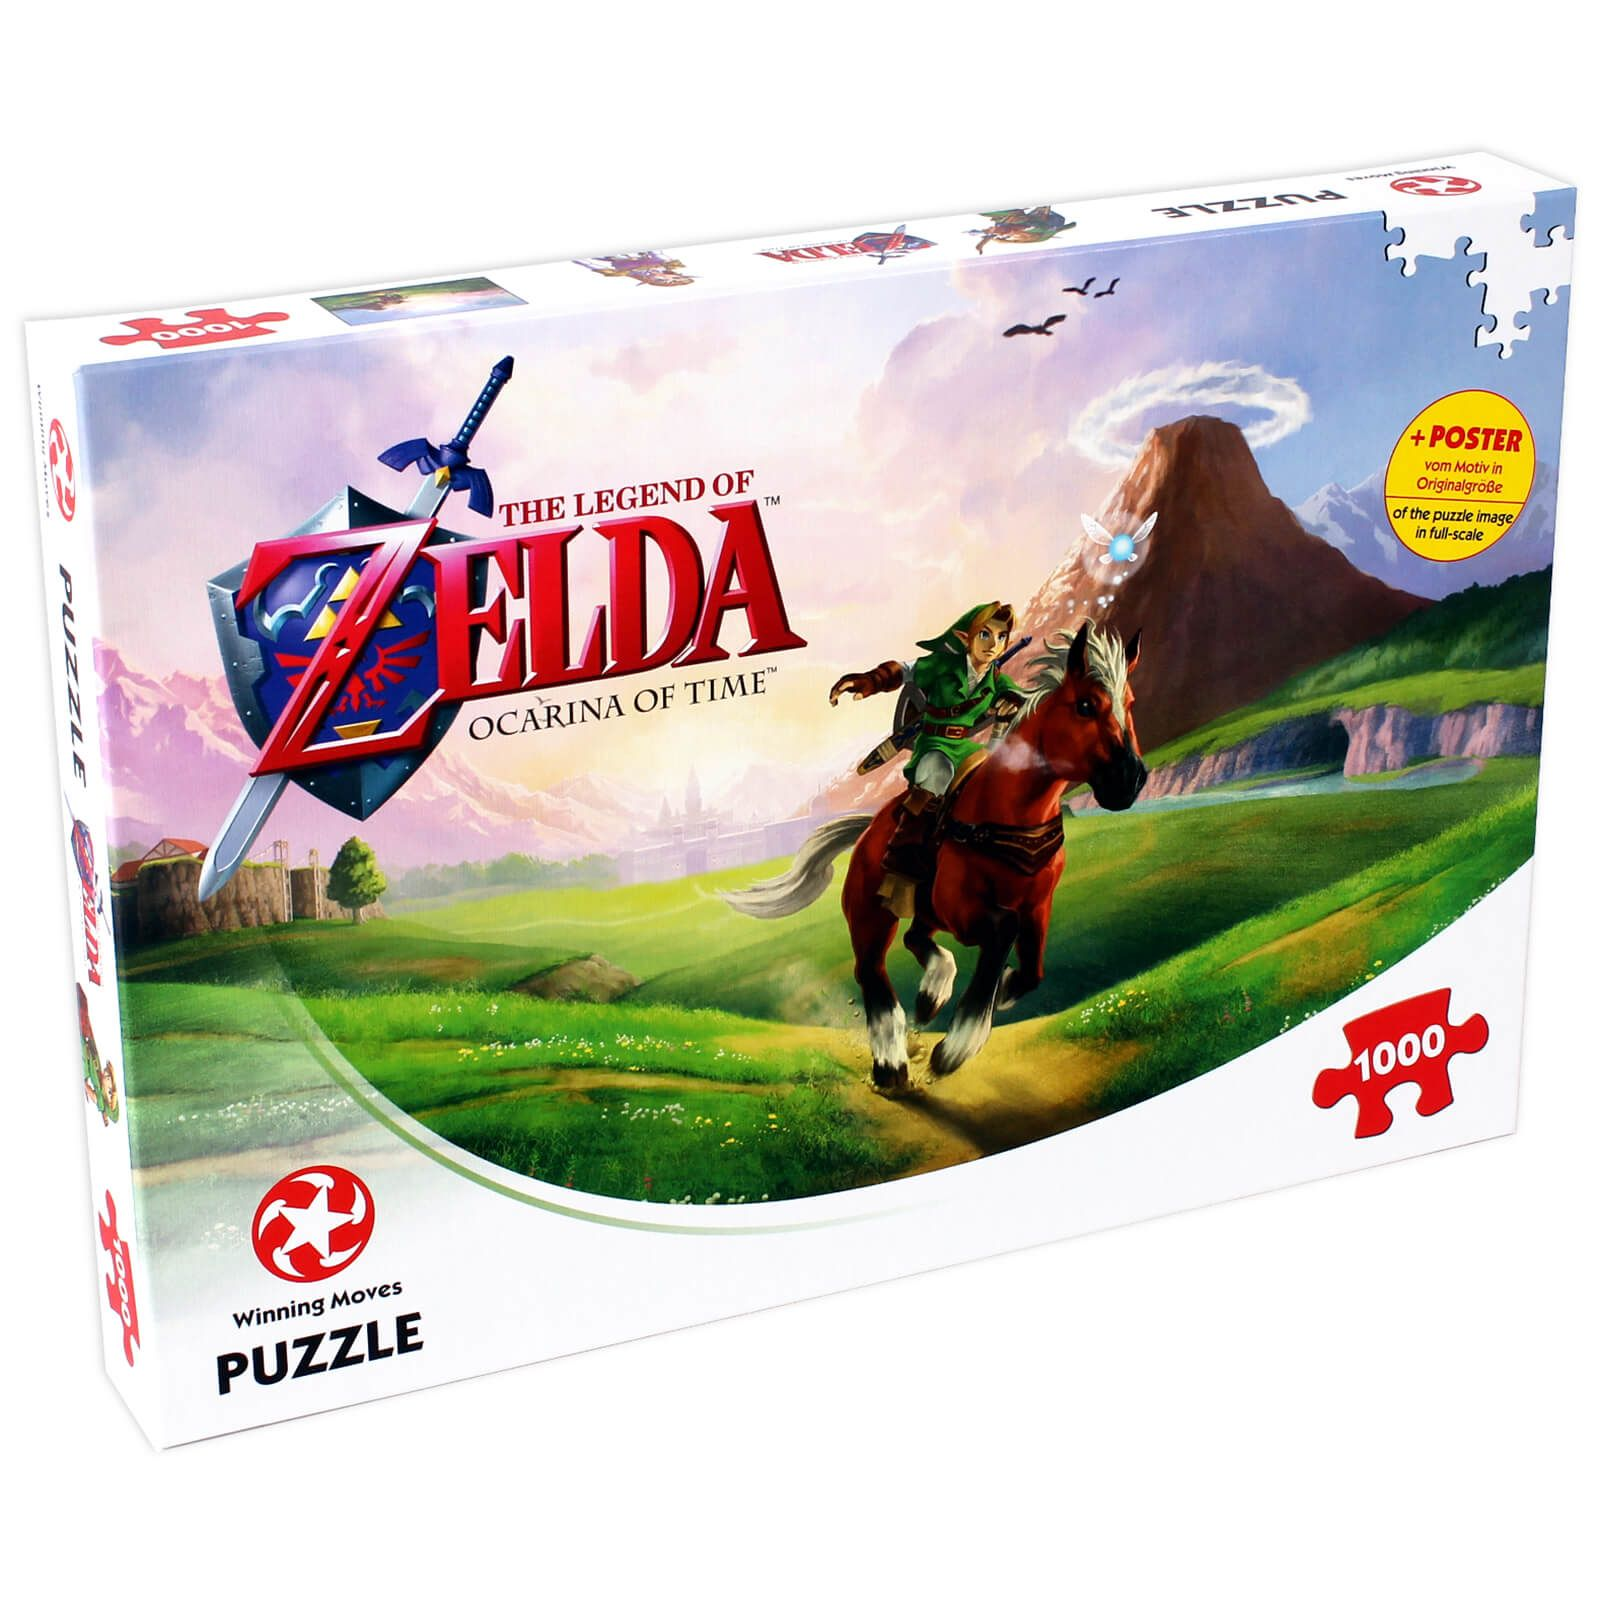 1000 Piece Jigsaw Puzzle The Legend of Zelda Ocarina of